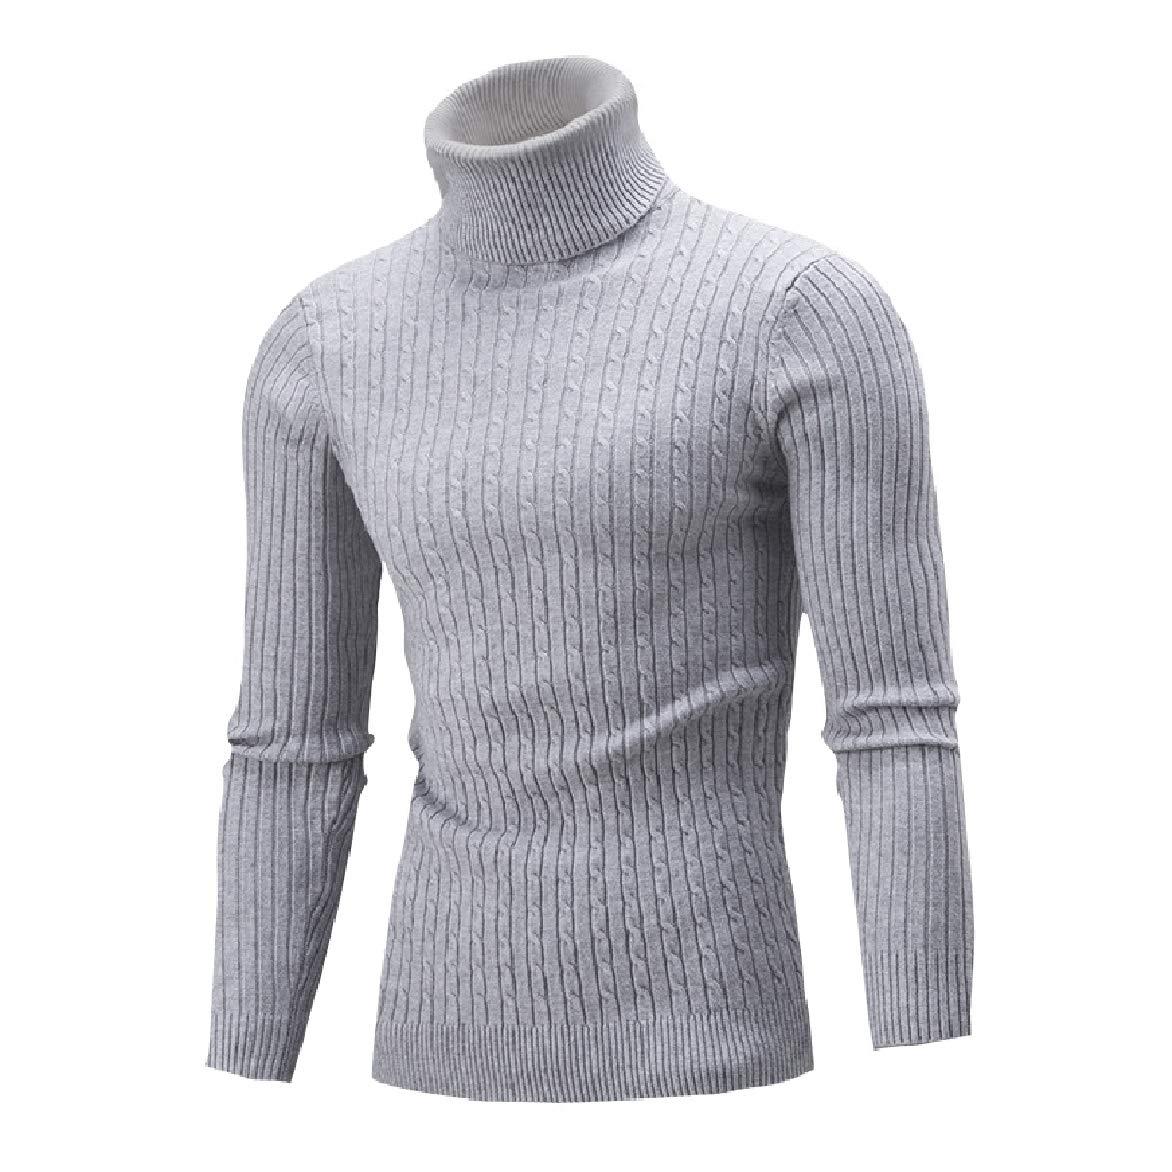 Winwinus Mens Slim Mock Neck Knit Long-Sleeve Solid Sweater Pullover